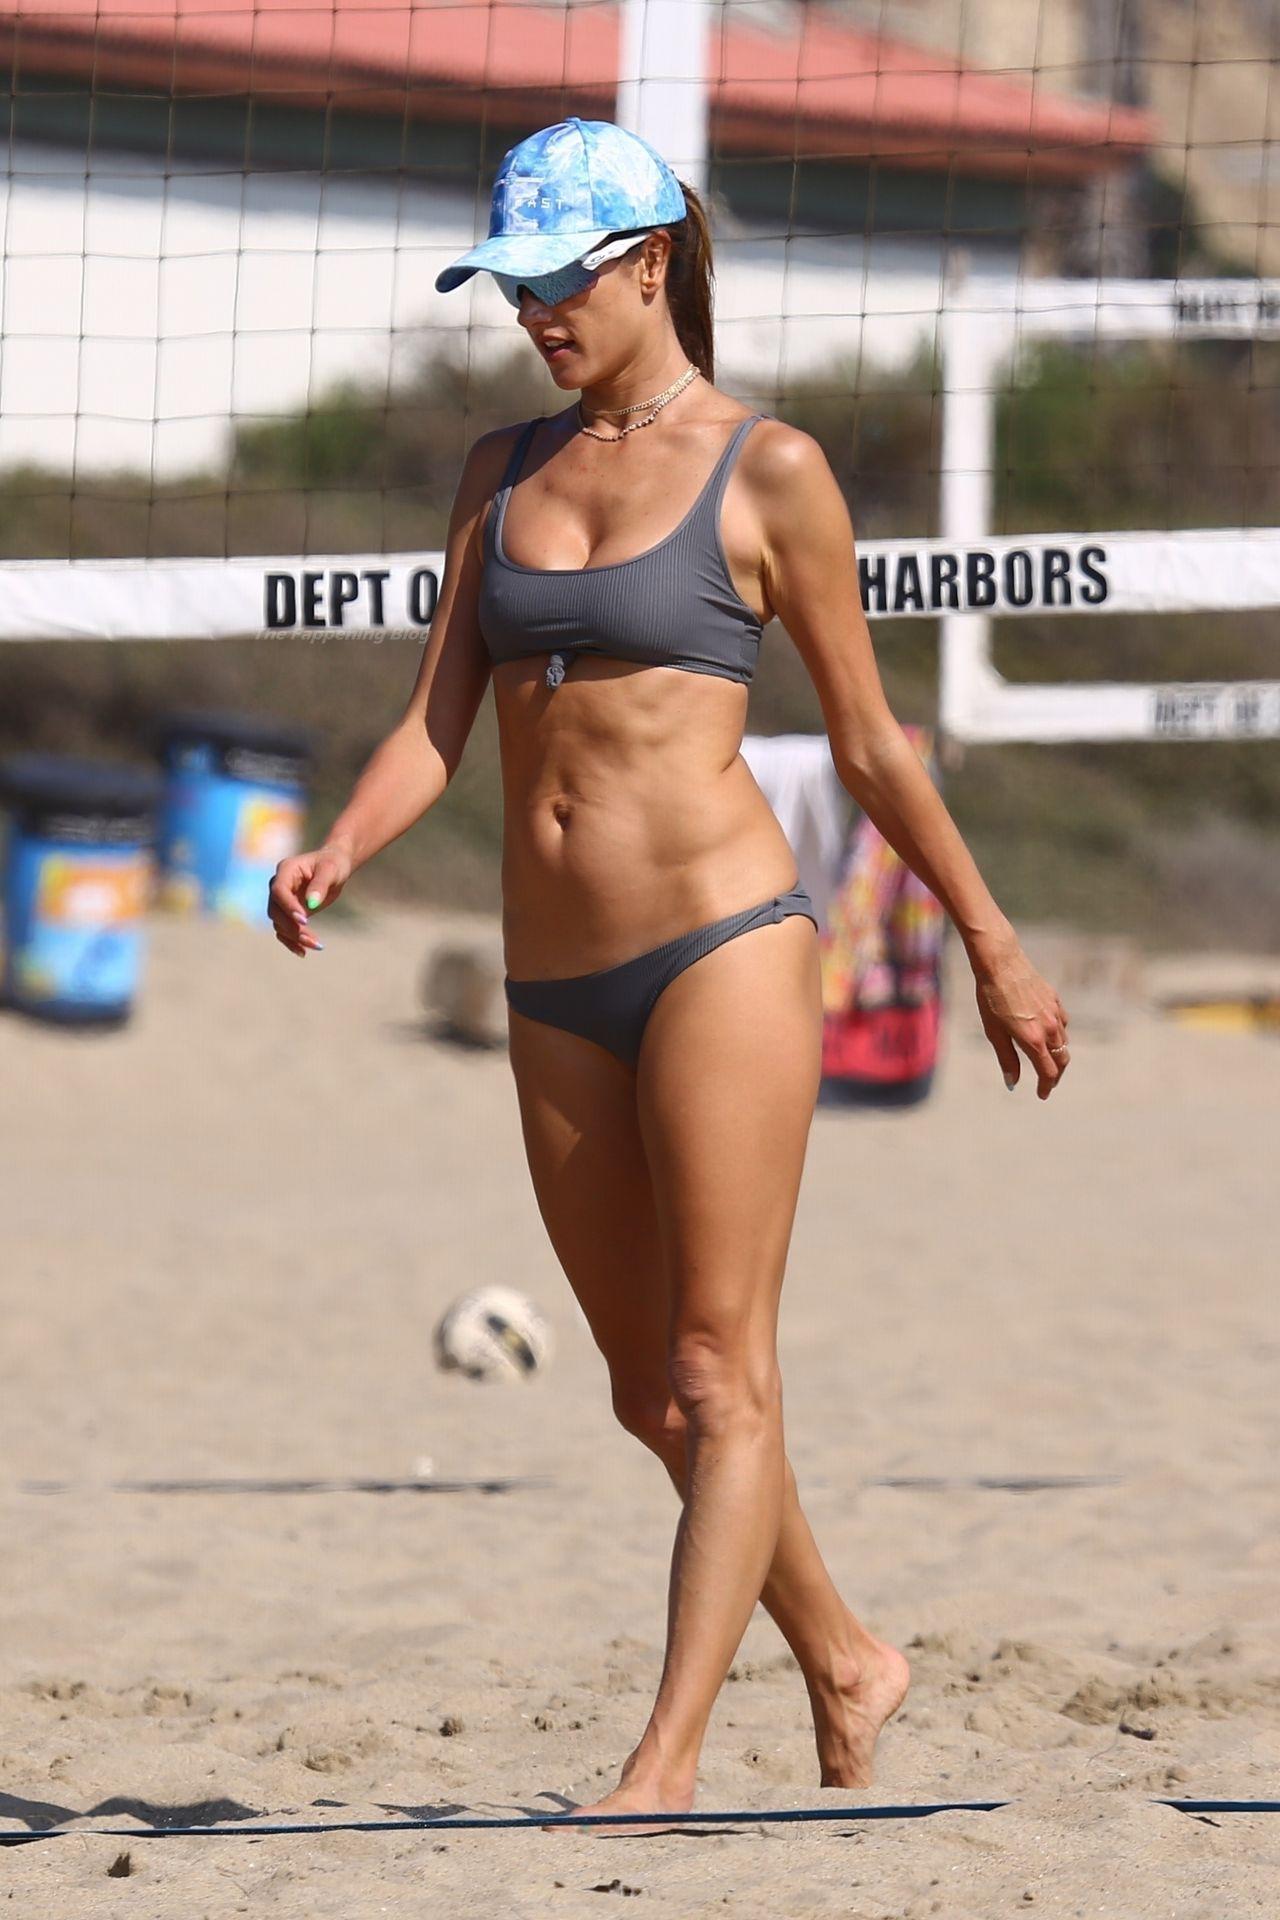 Alessandra-Ambrosio-Sexy-The-Fappening-Blog-17-3.jpg